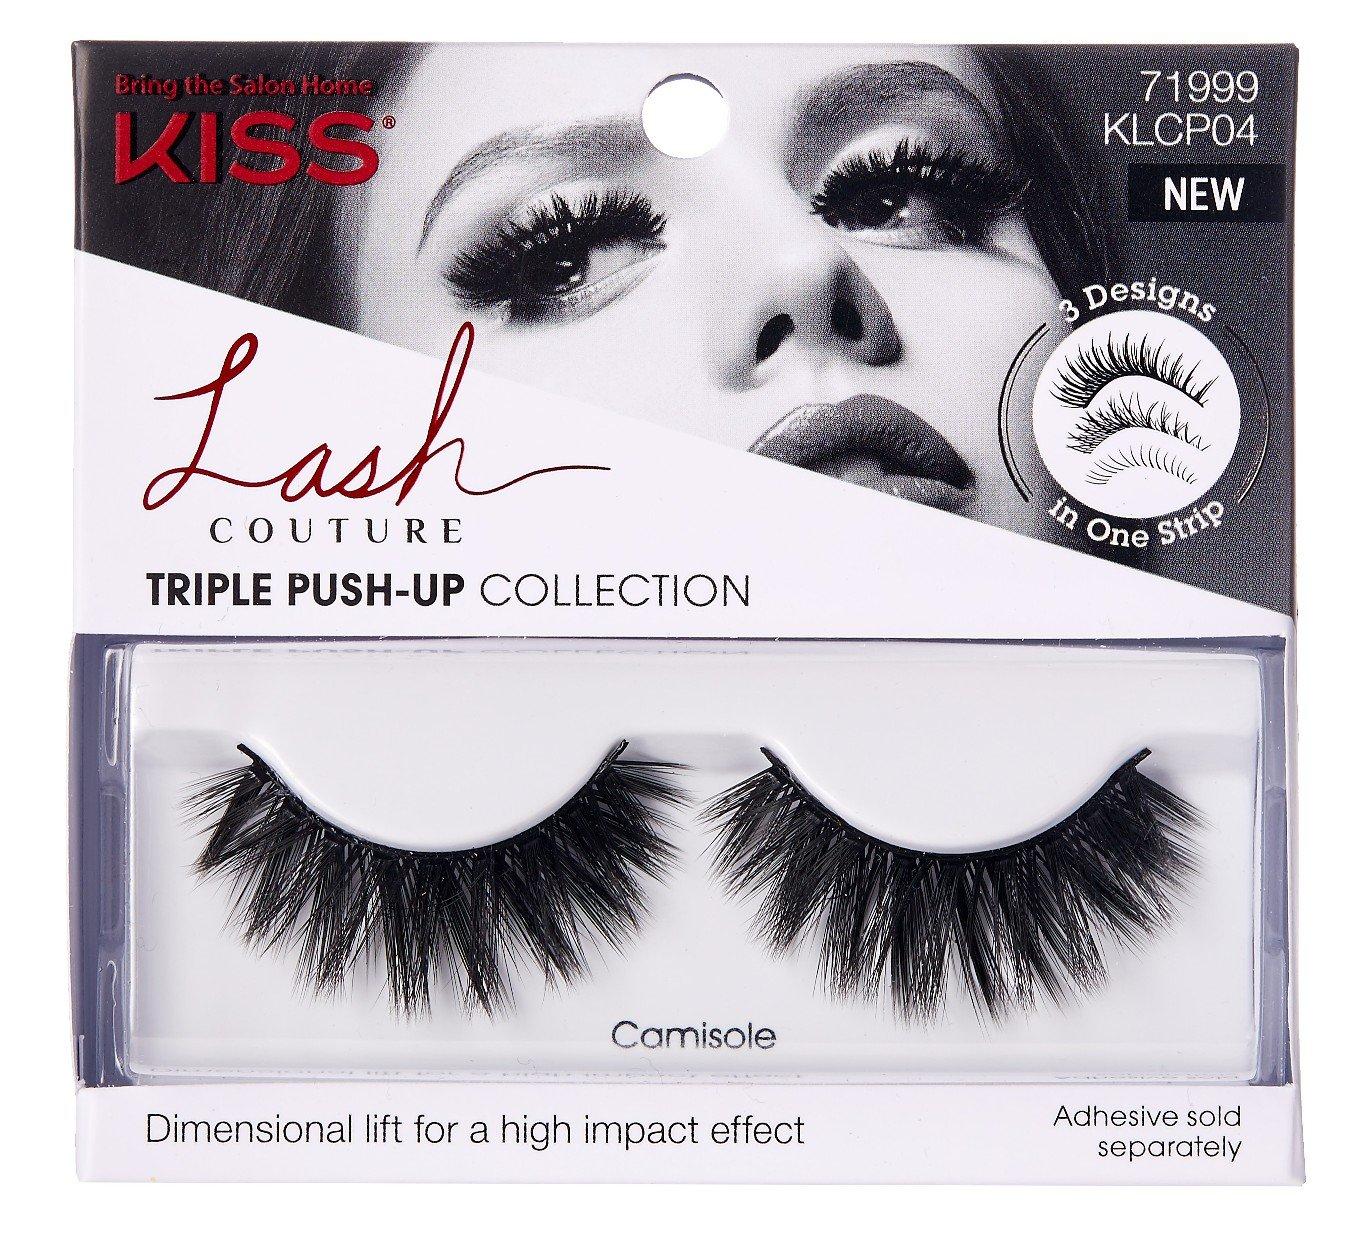 a1fc0dddd1b Amazon.com: Kiss Lash Couture Triple Push-Up Camisole (3 Pack): Beauty